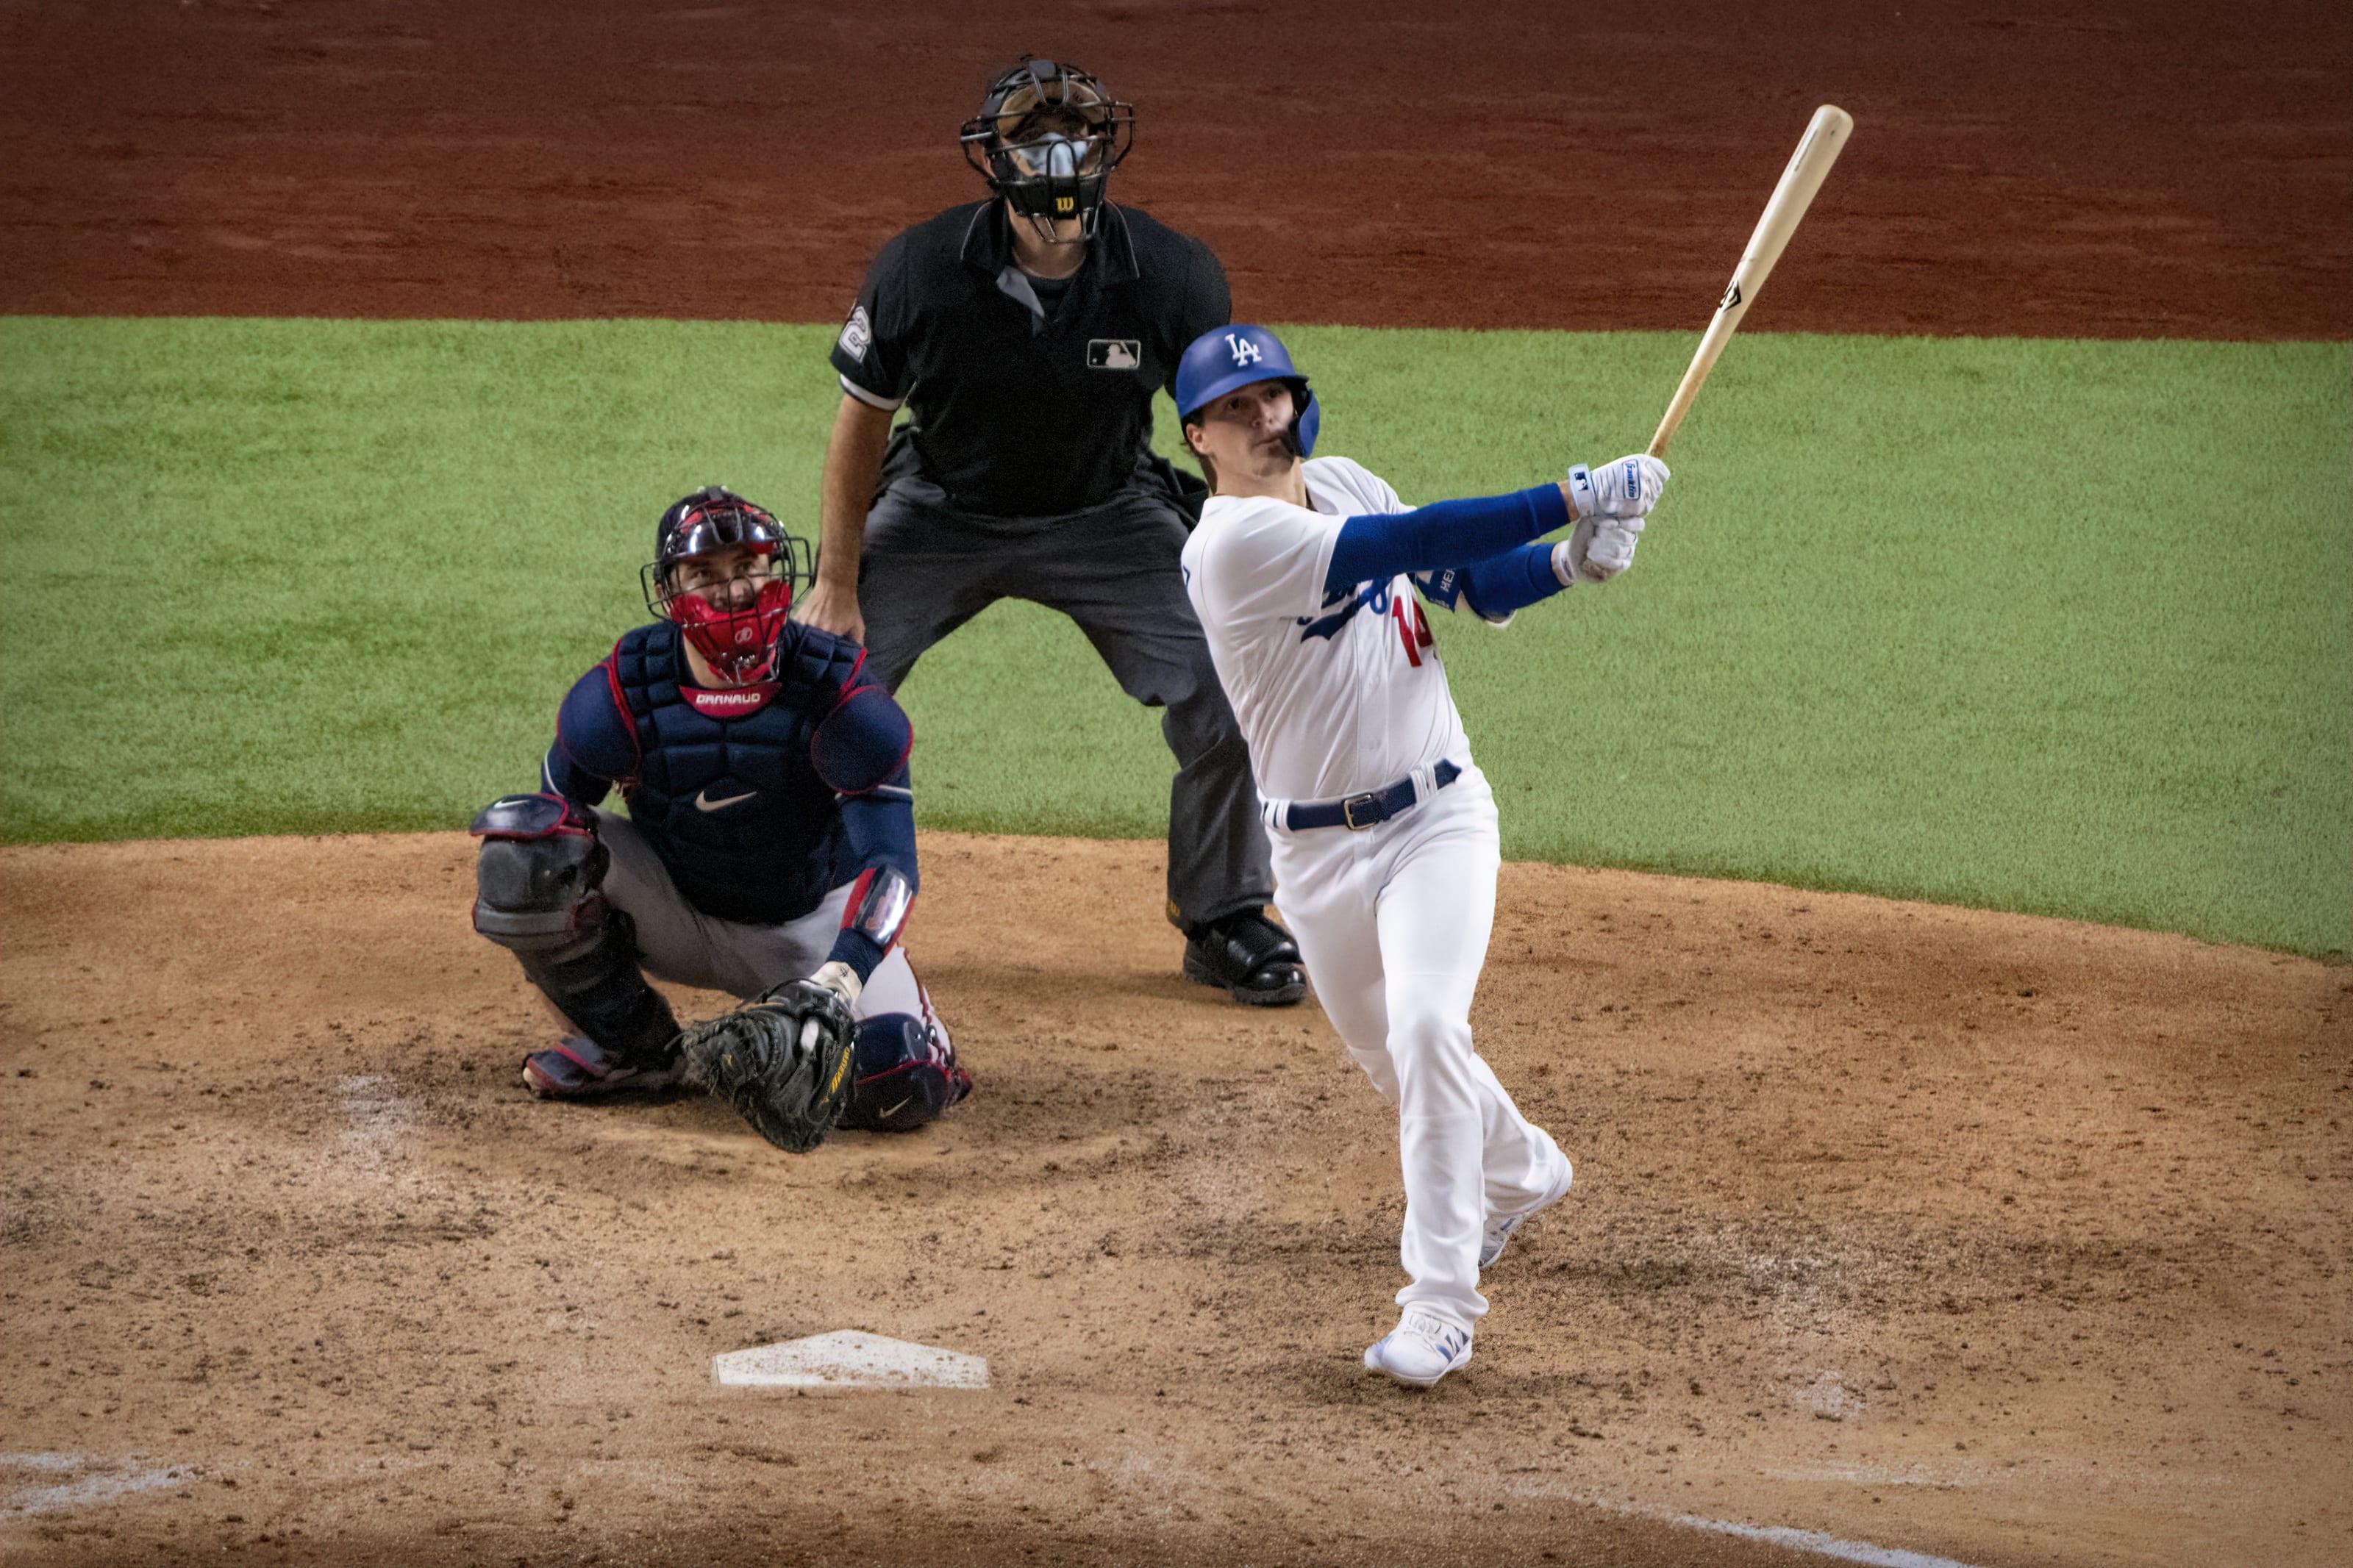 Chicago Cubs, Enrique Hernandez